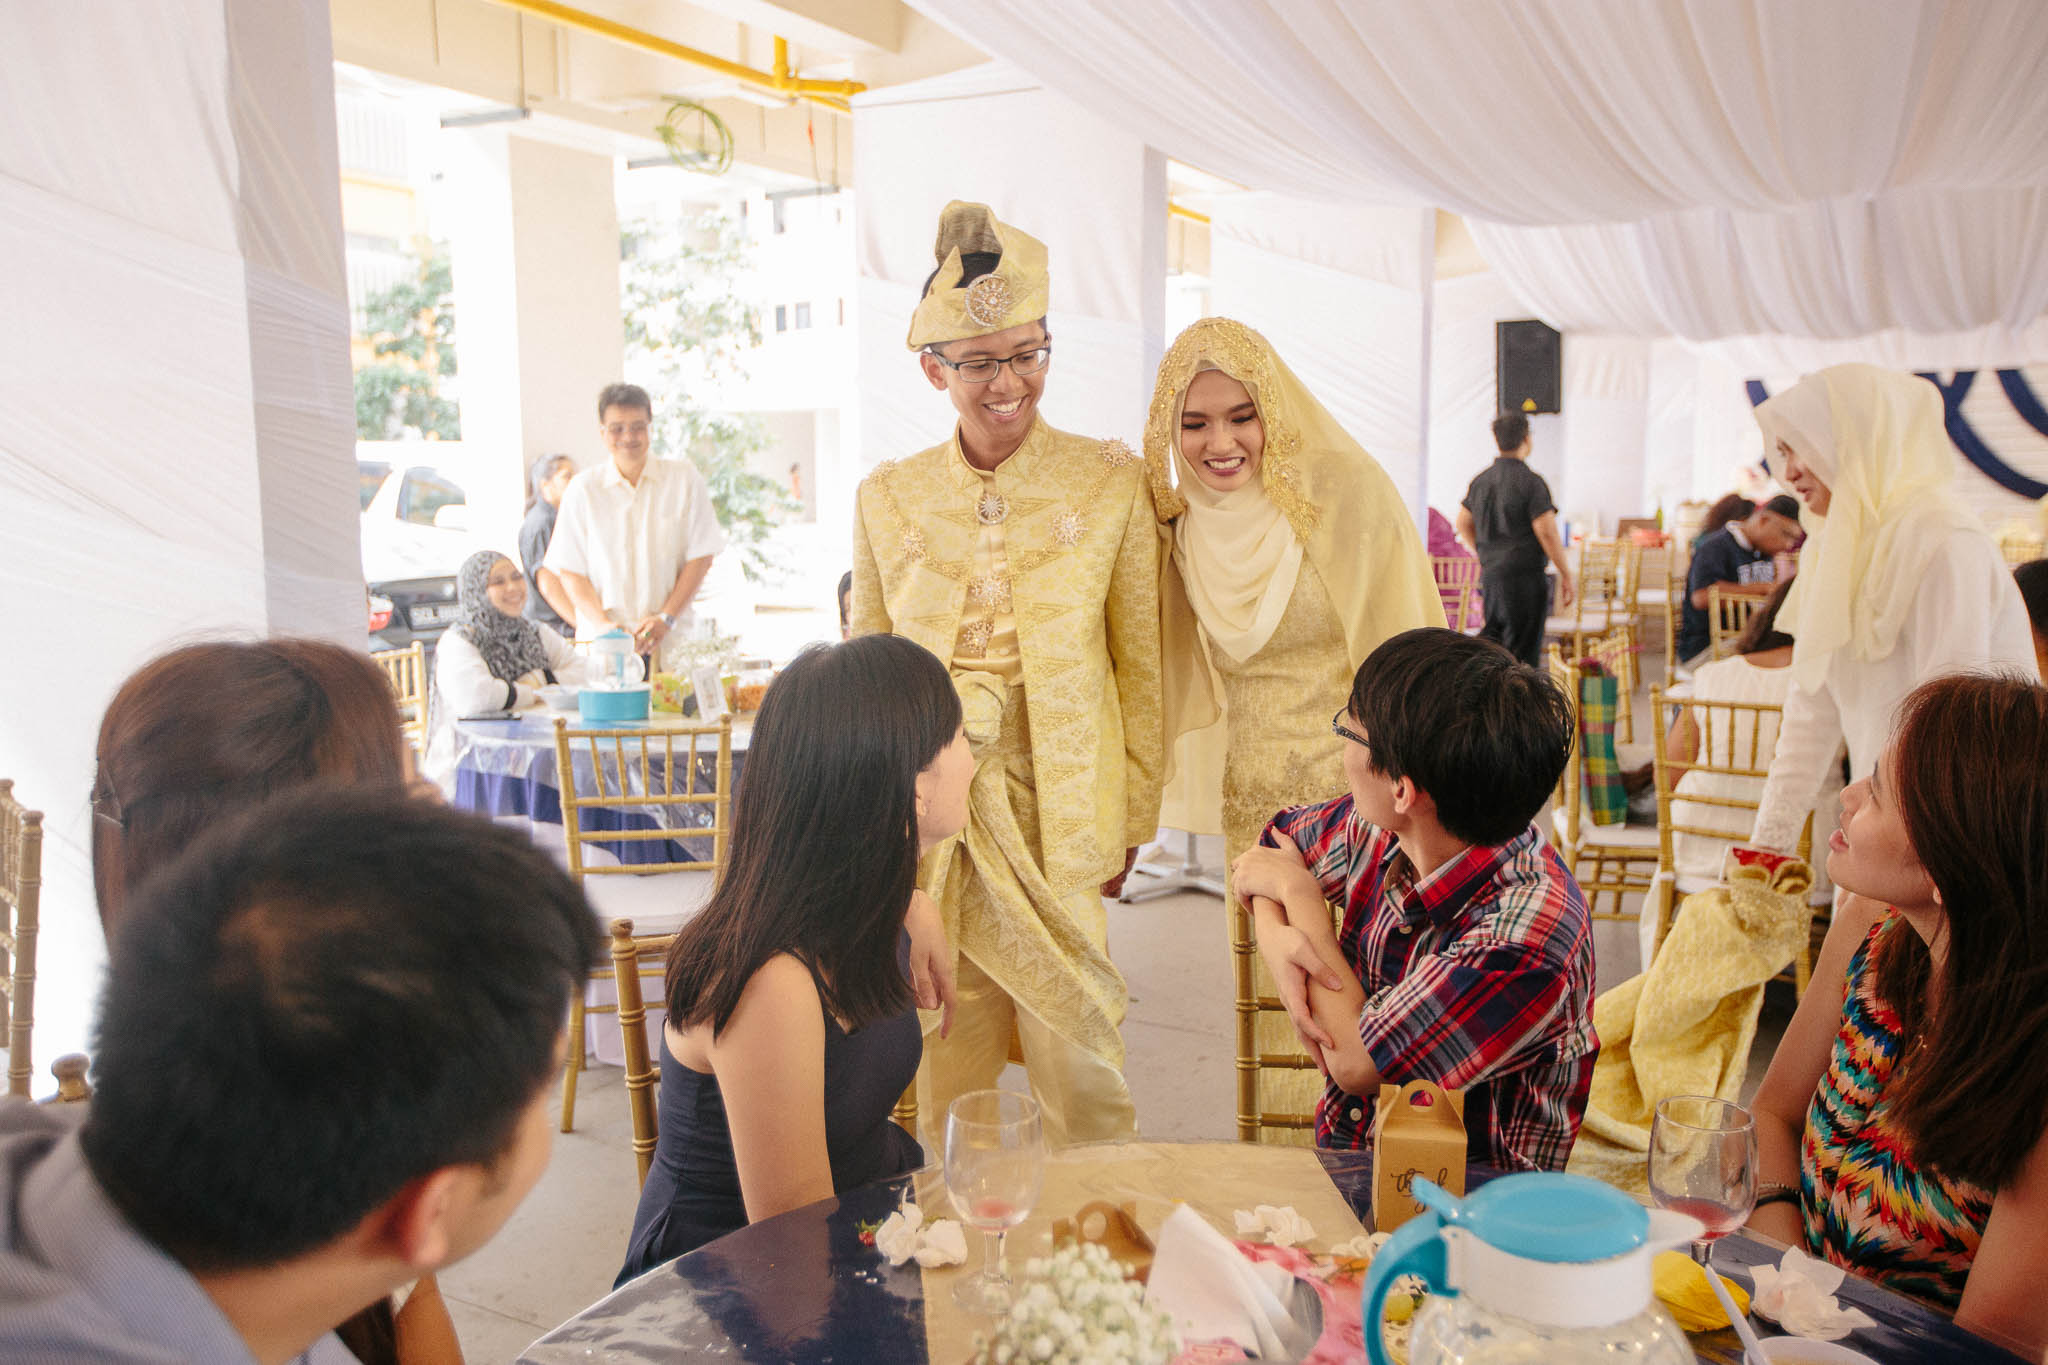 singapore-wedding-photographer-sharalyn-syazwan-052.jpg